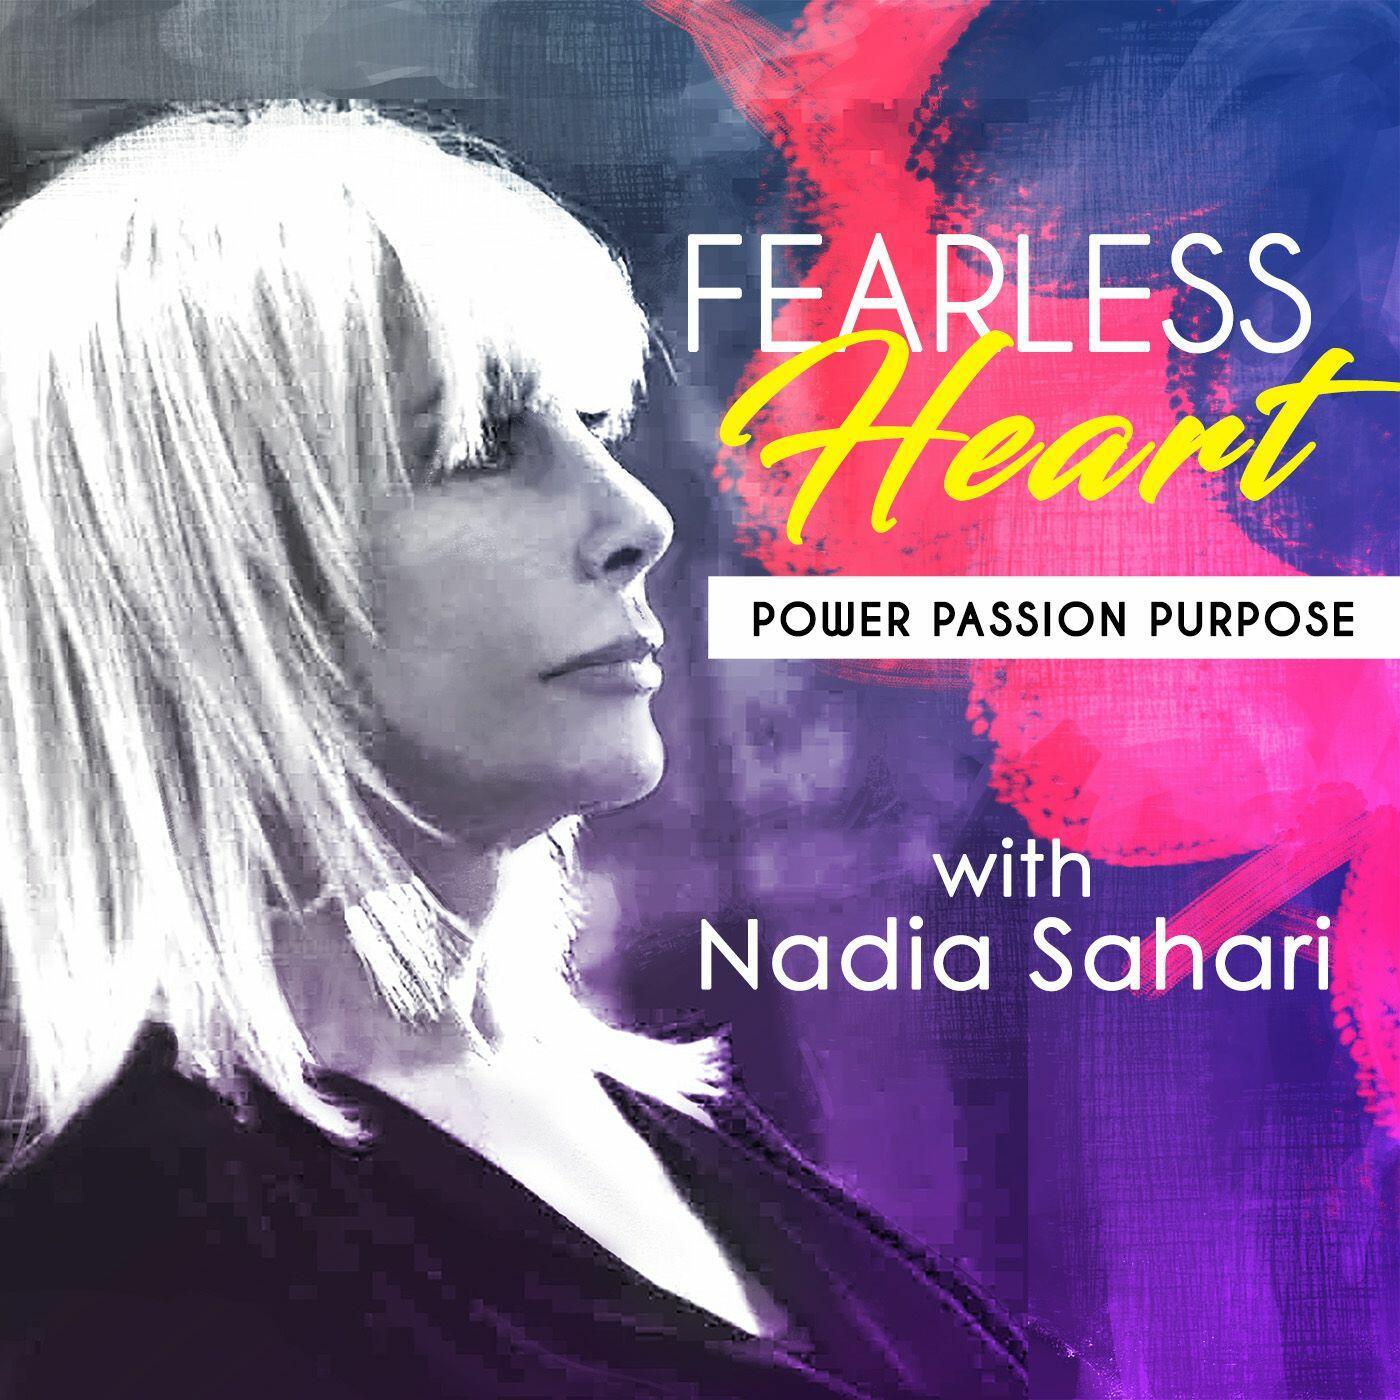 FEARLESS HEART with Nadia Sahari